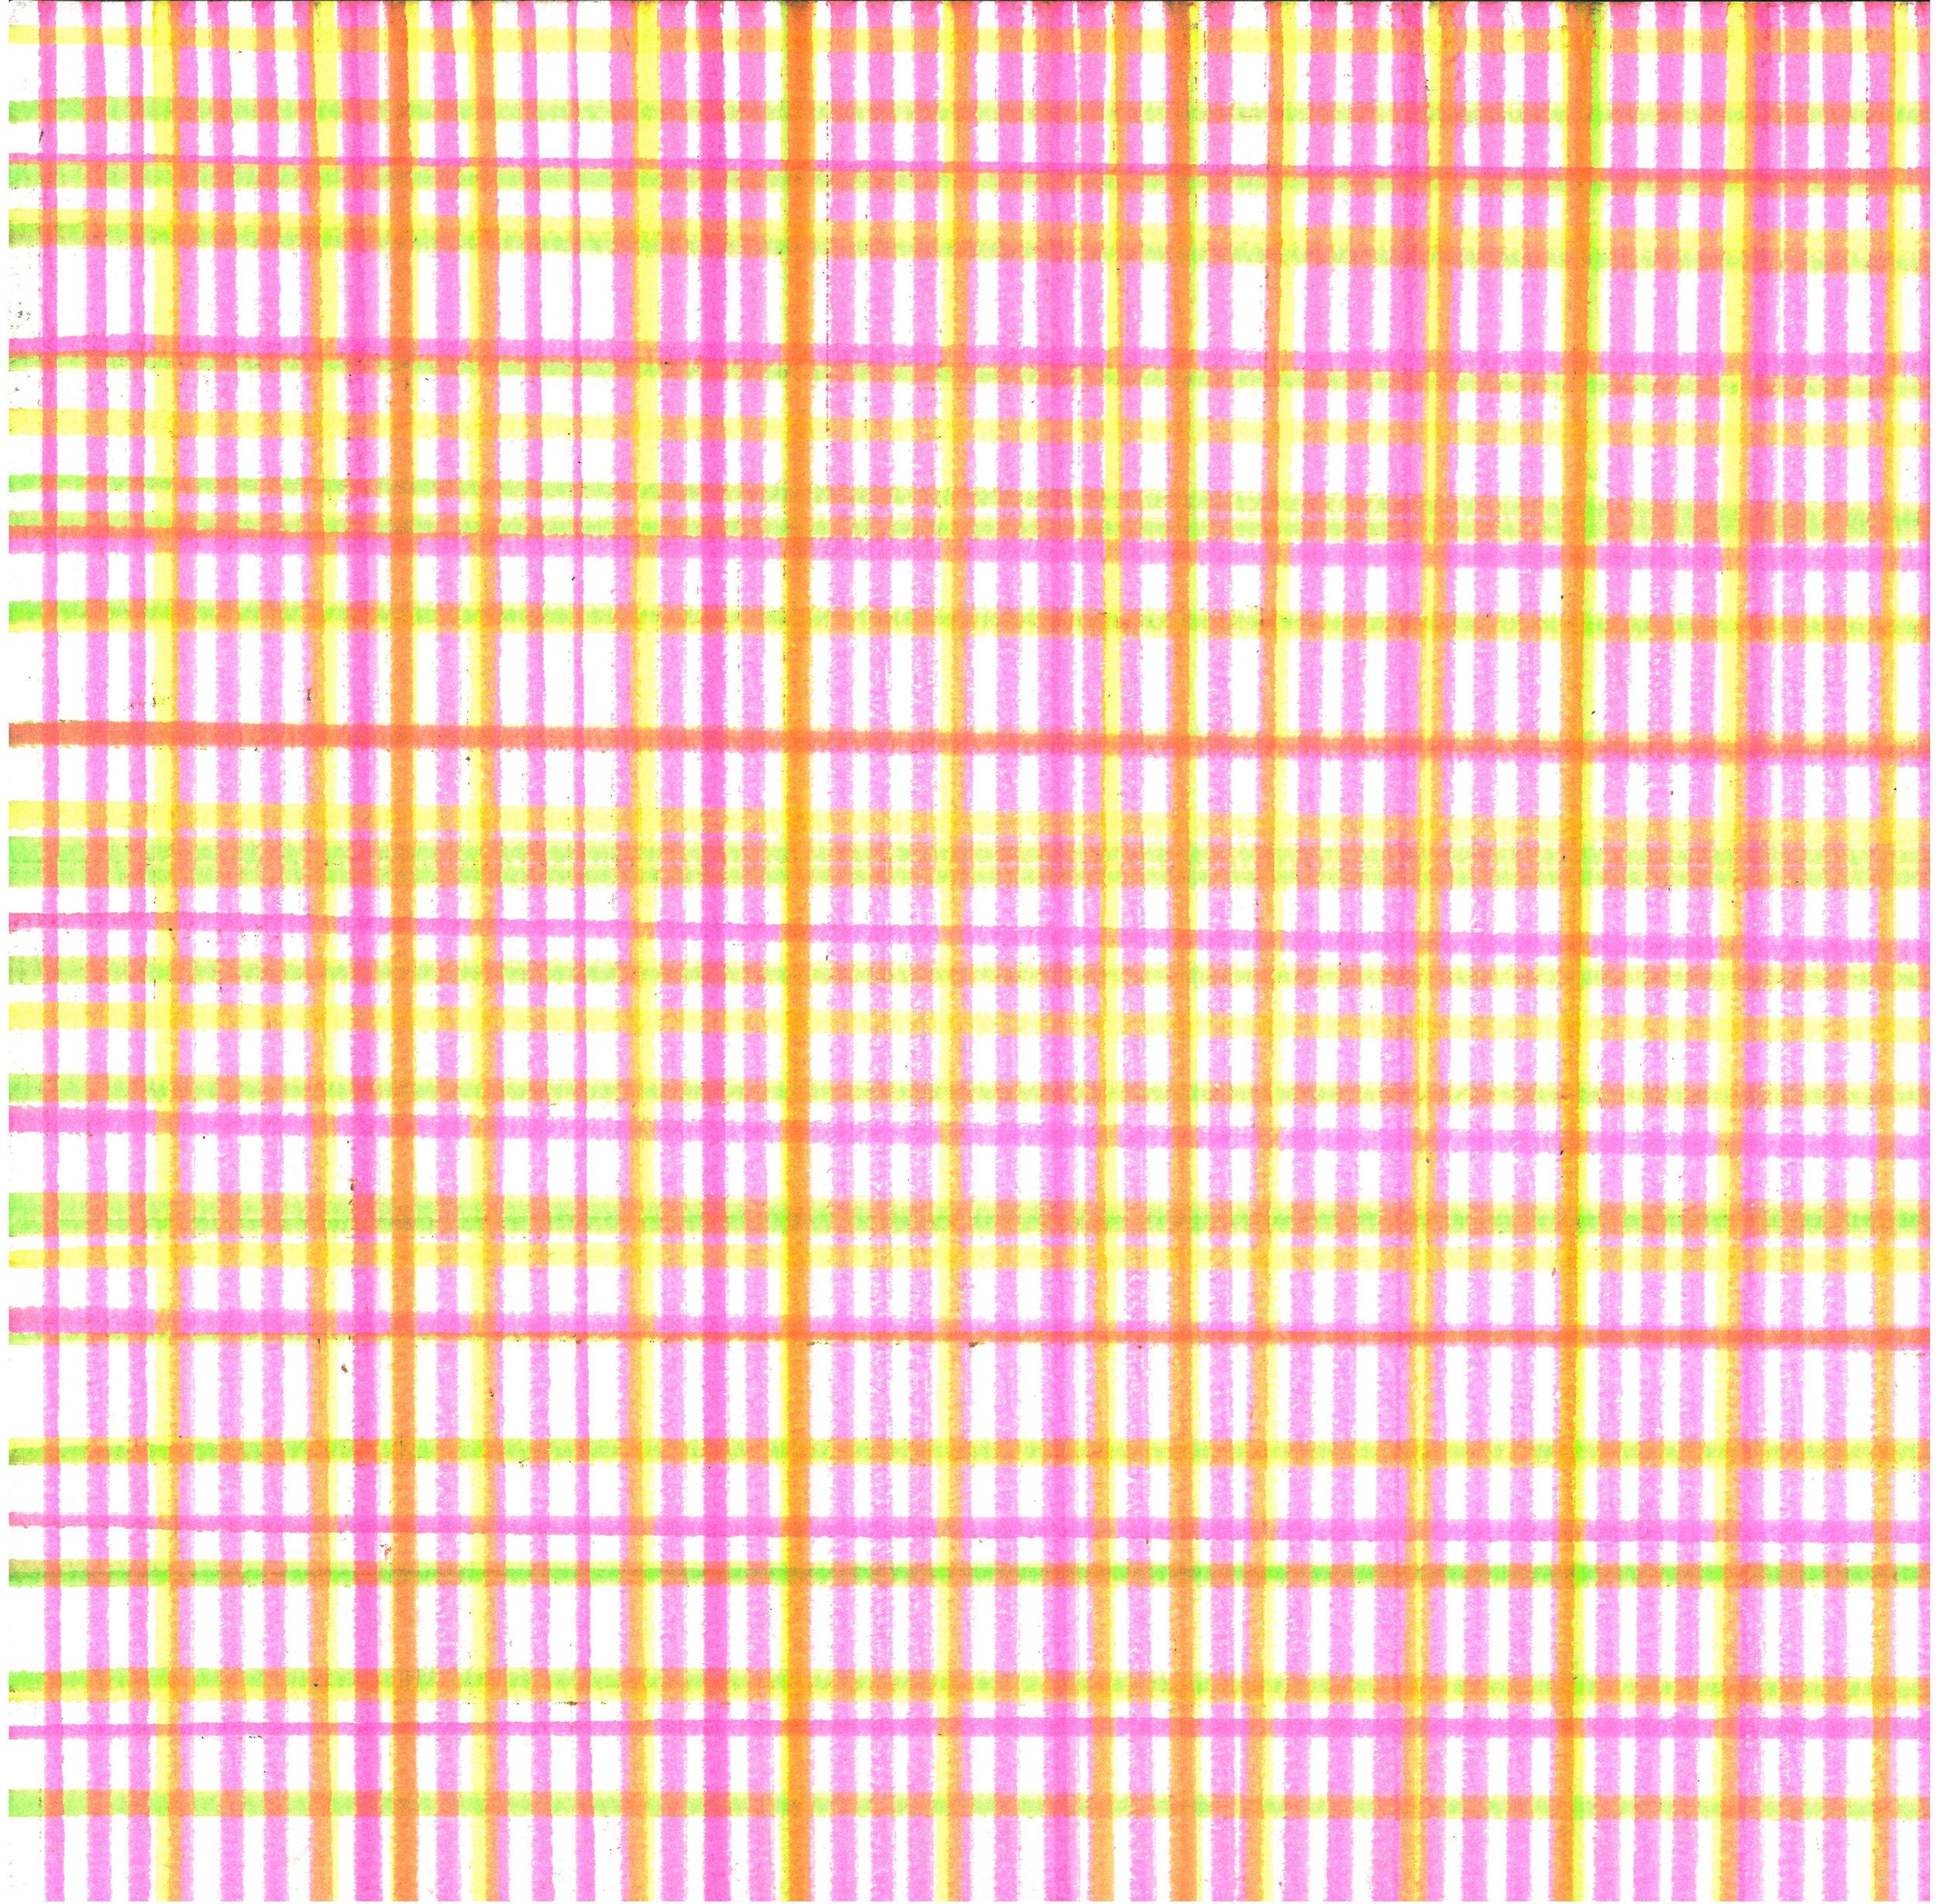 Highlight Checker Series III